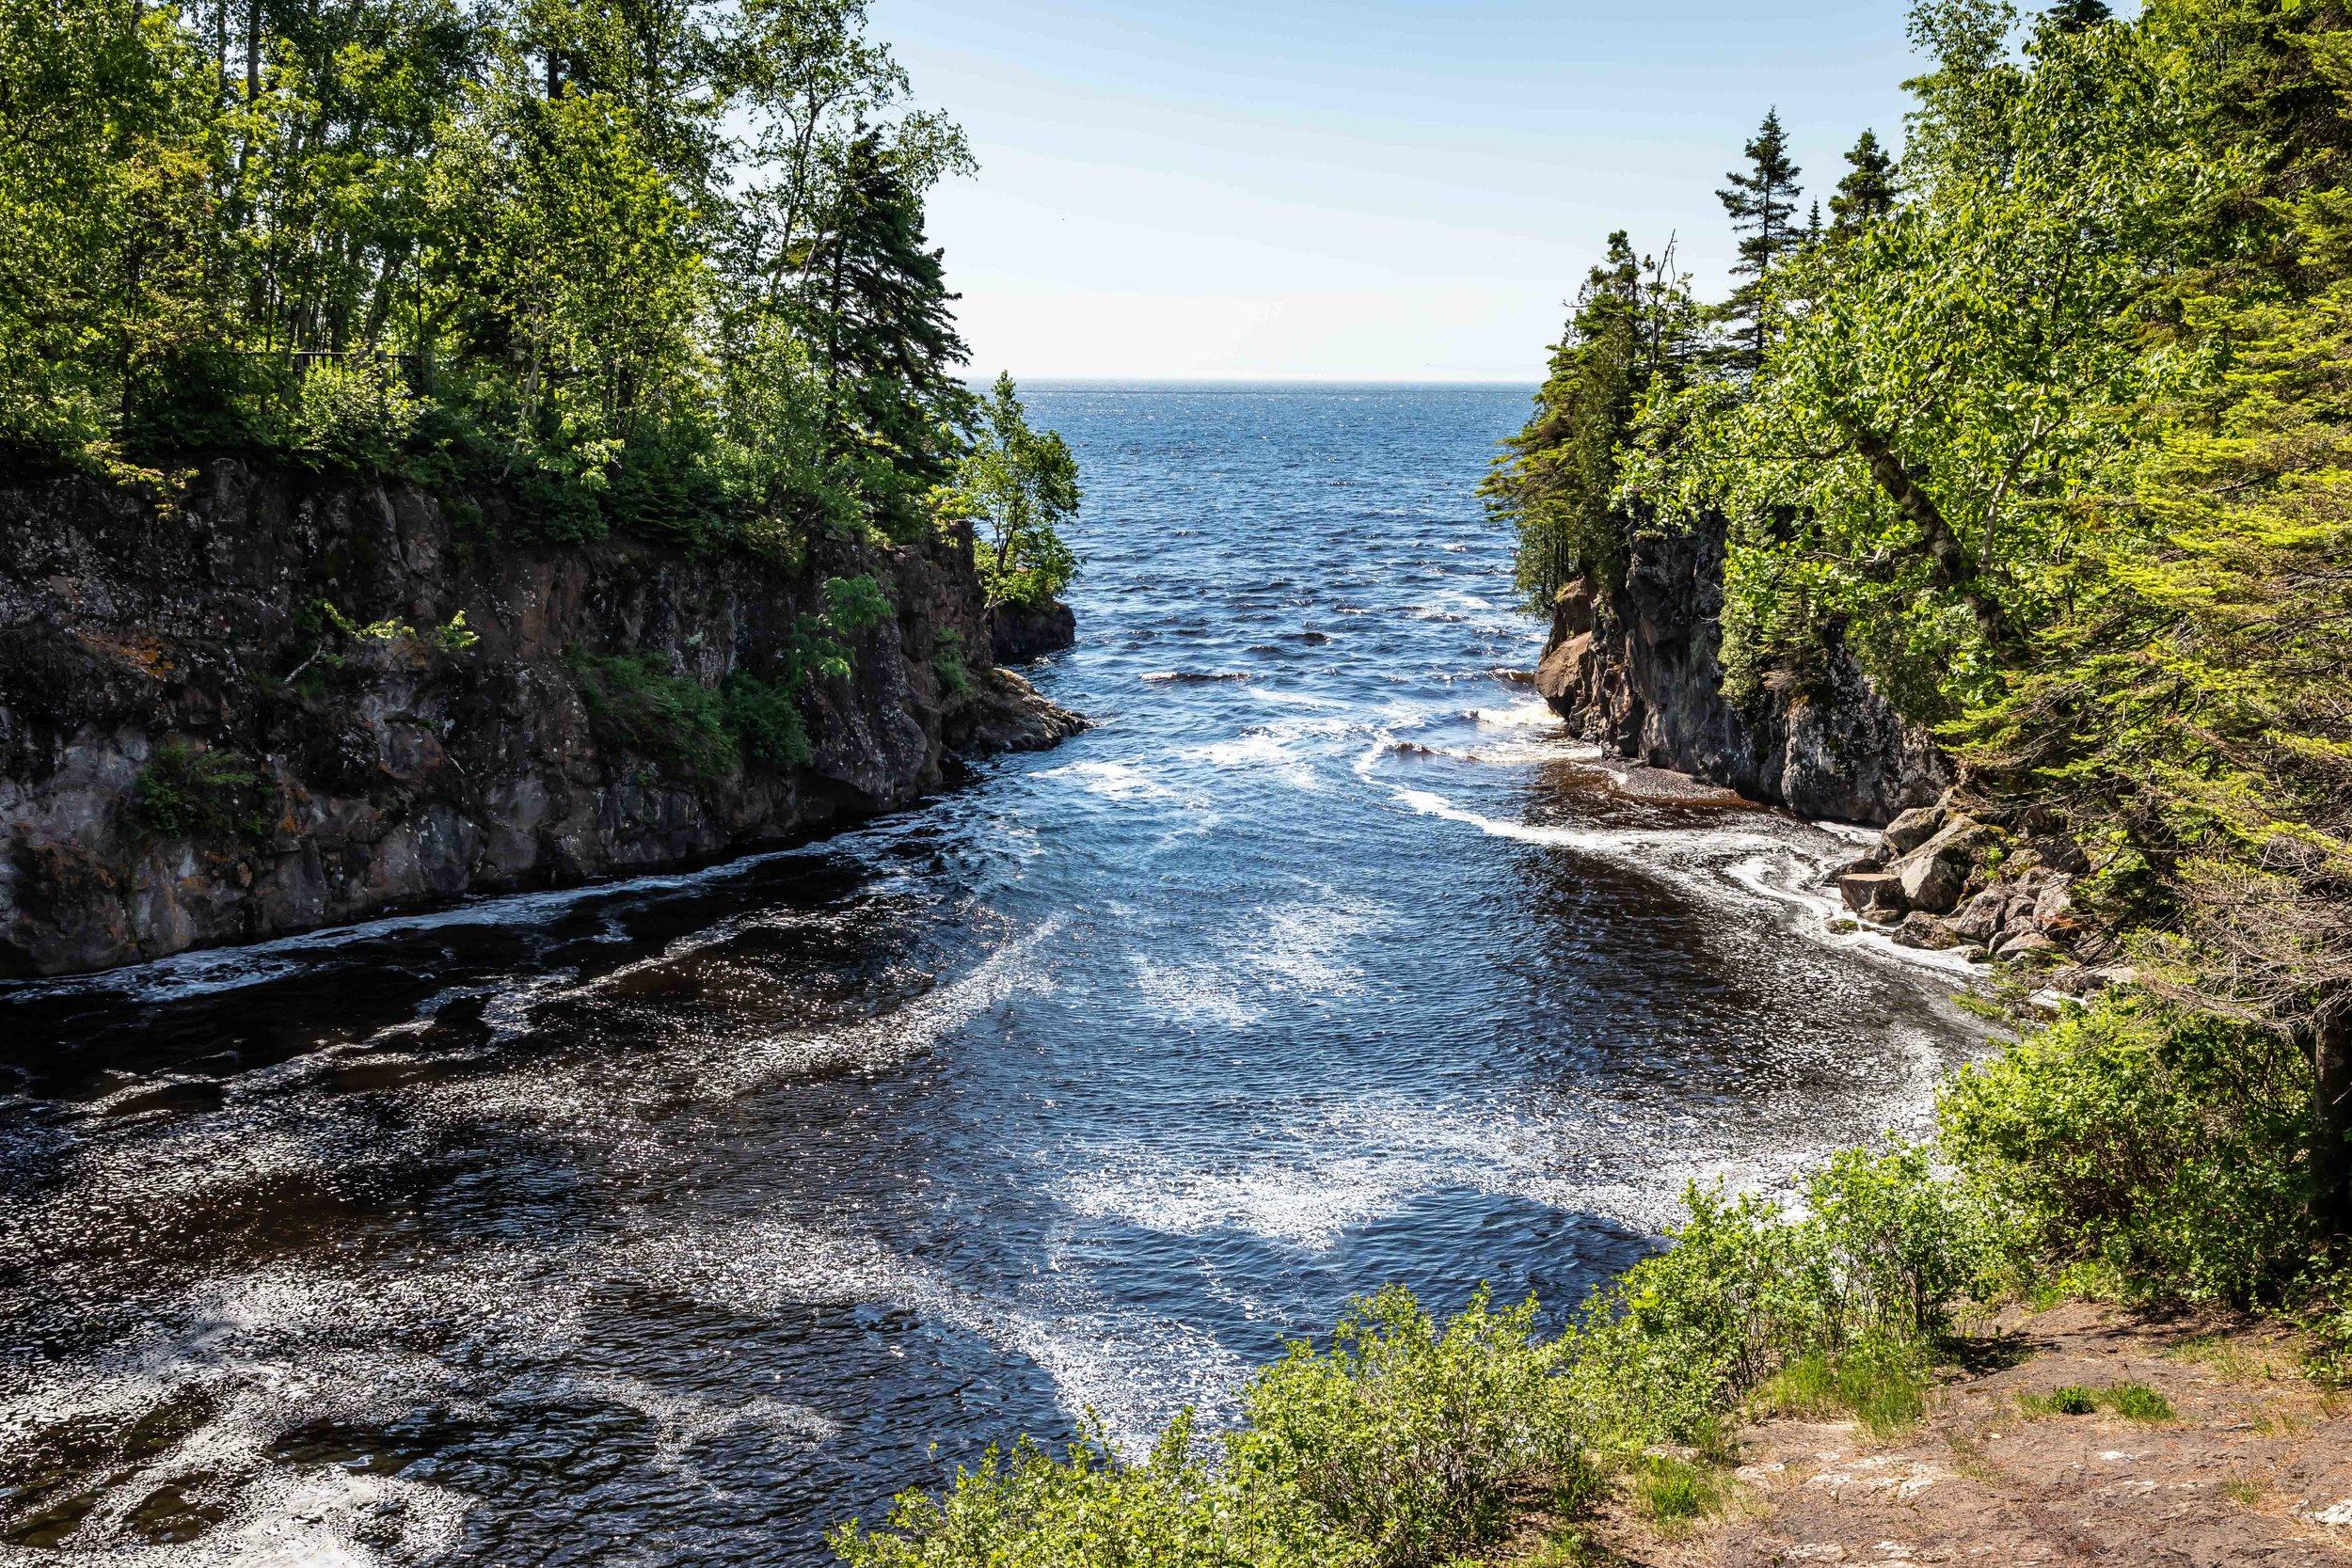 Lake Superior: Water's Destination